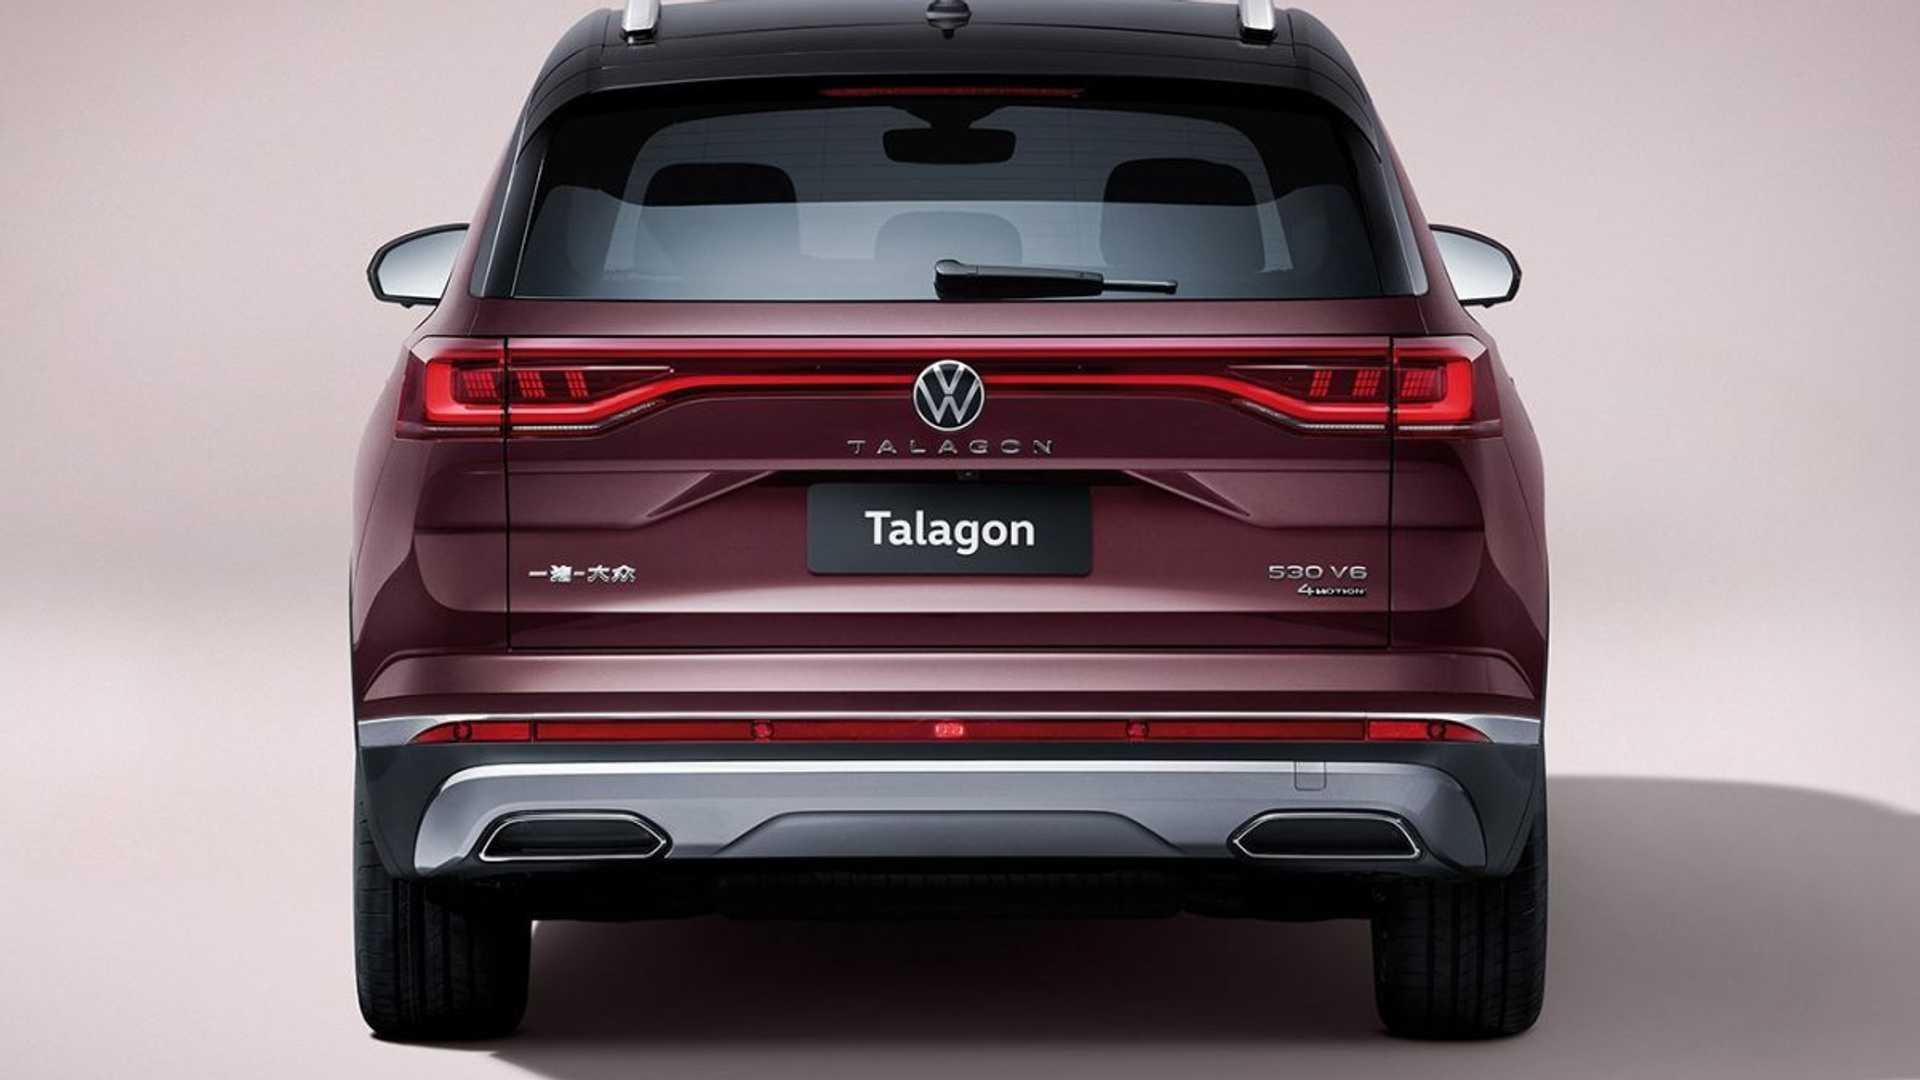 Volkswagen-Talagon-14